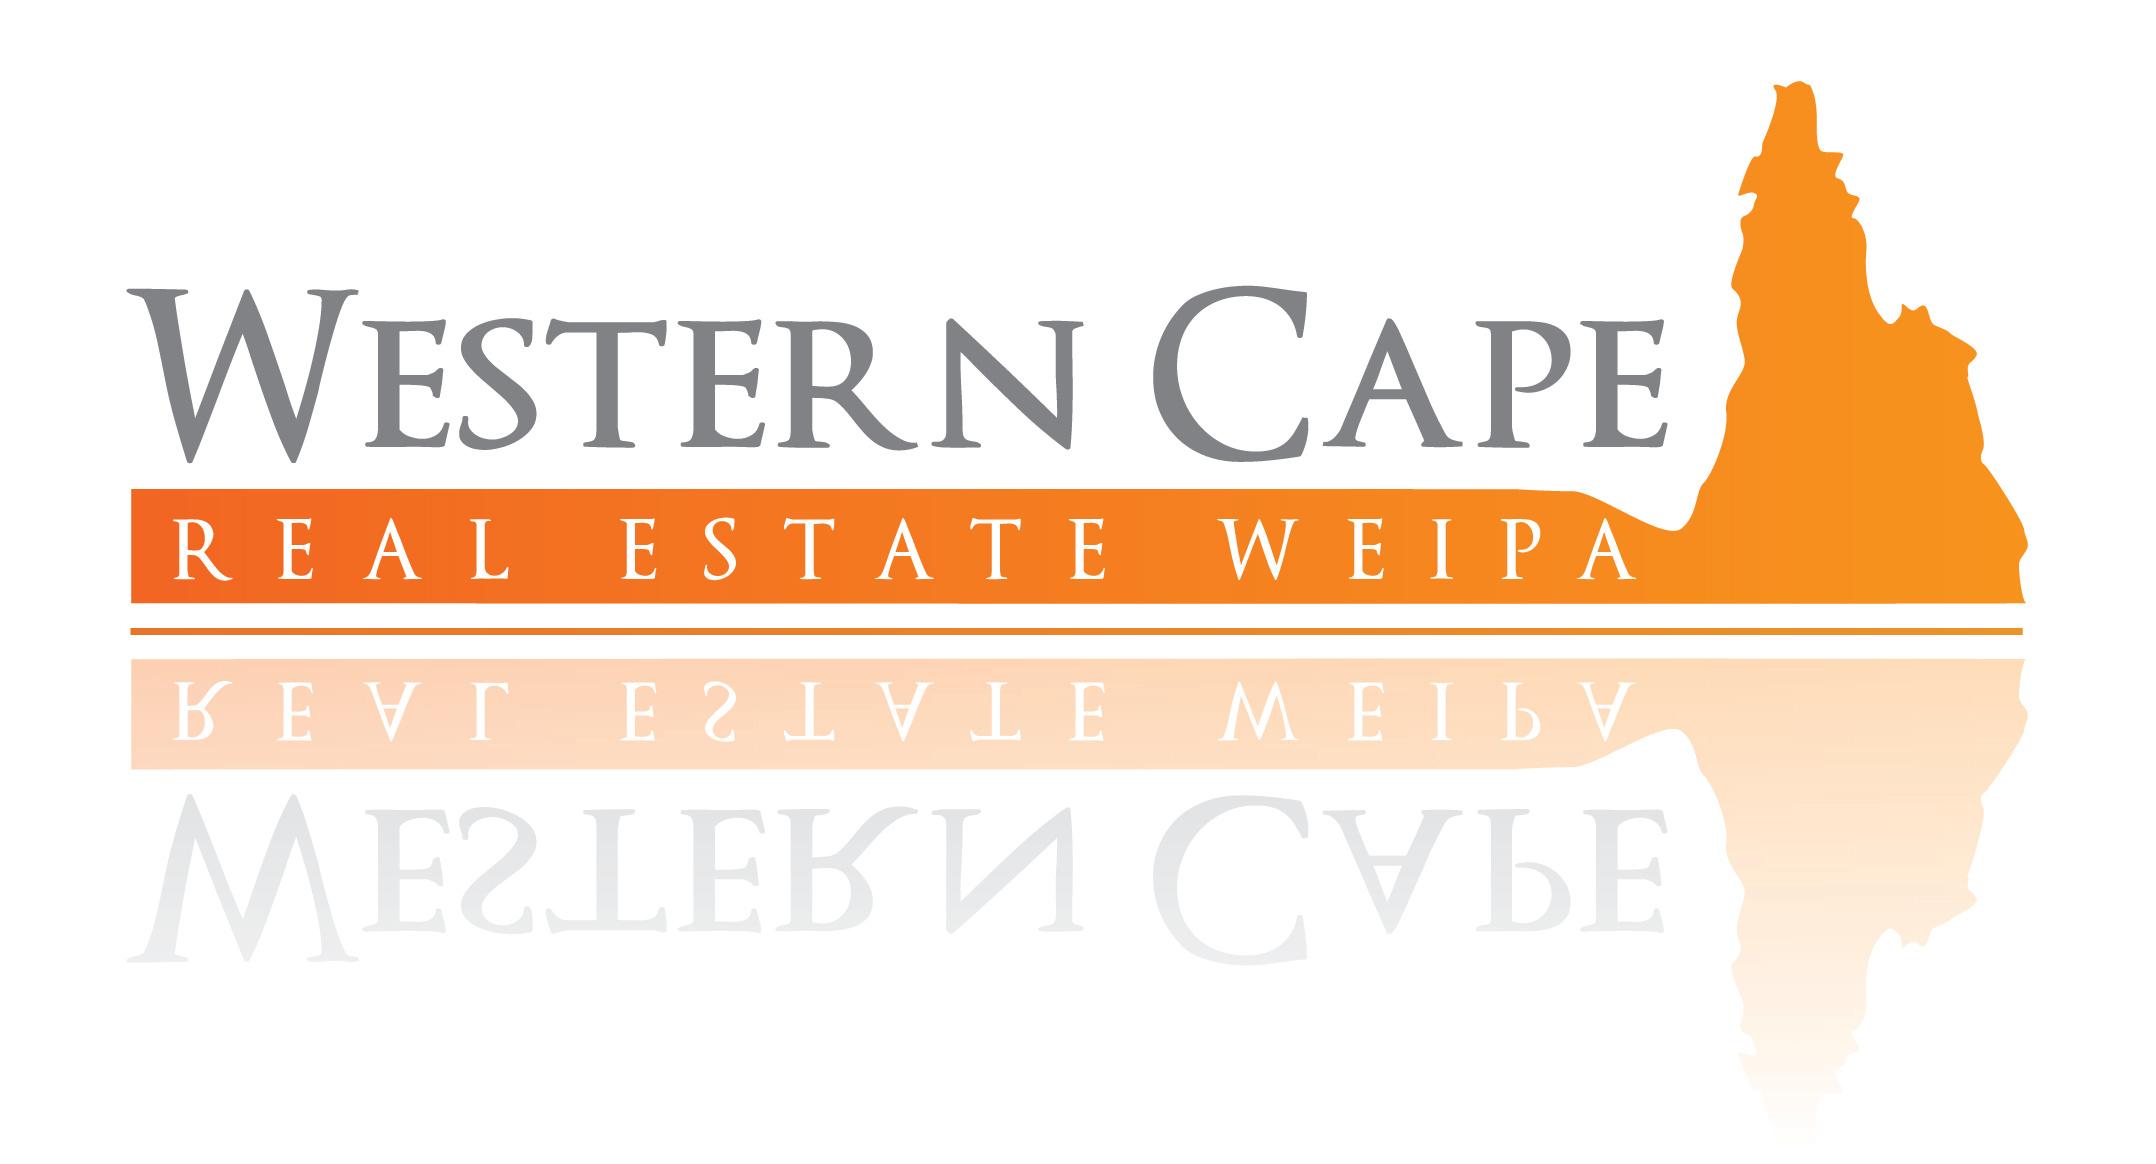 WESTERN_CAPE_REAL_ESTATE_LOGO_CMYK